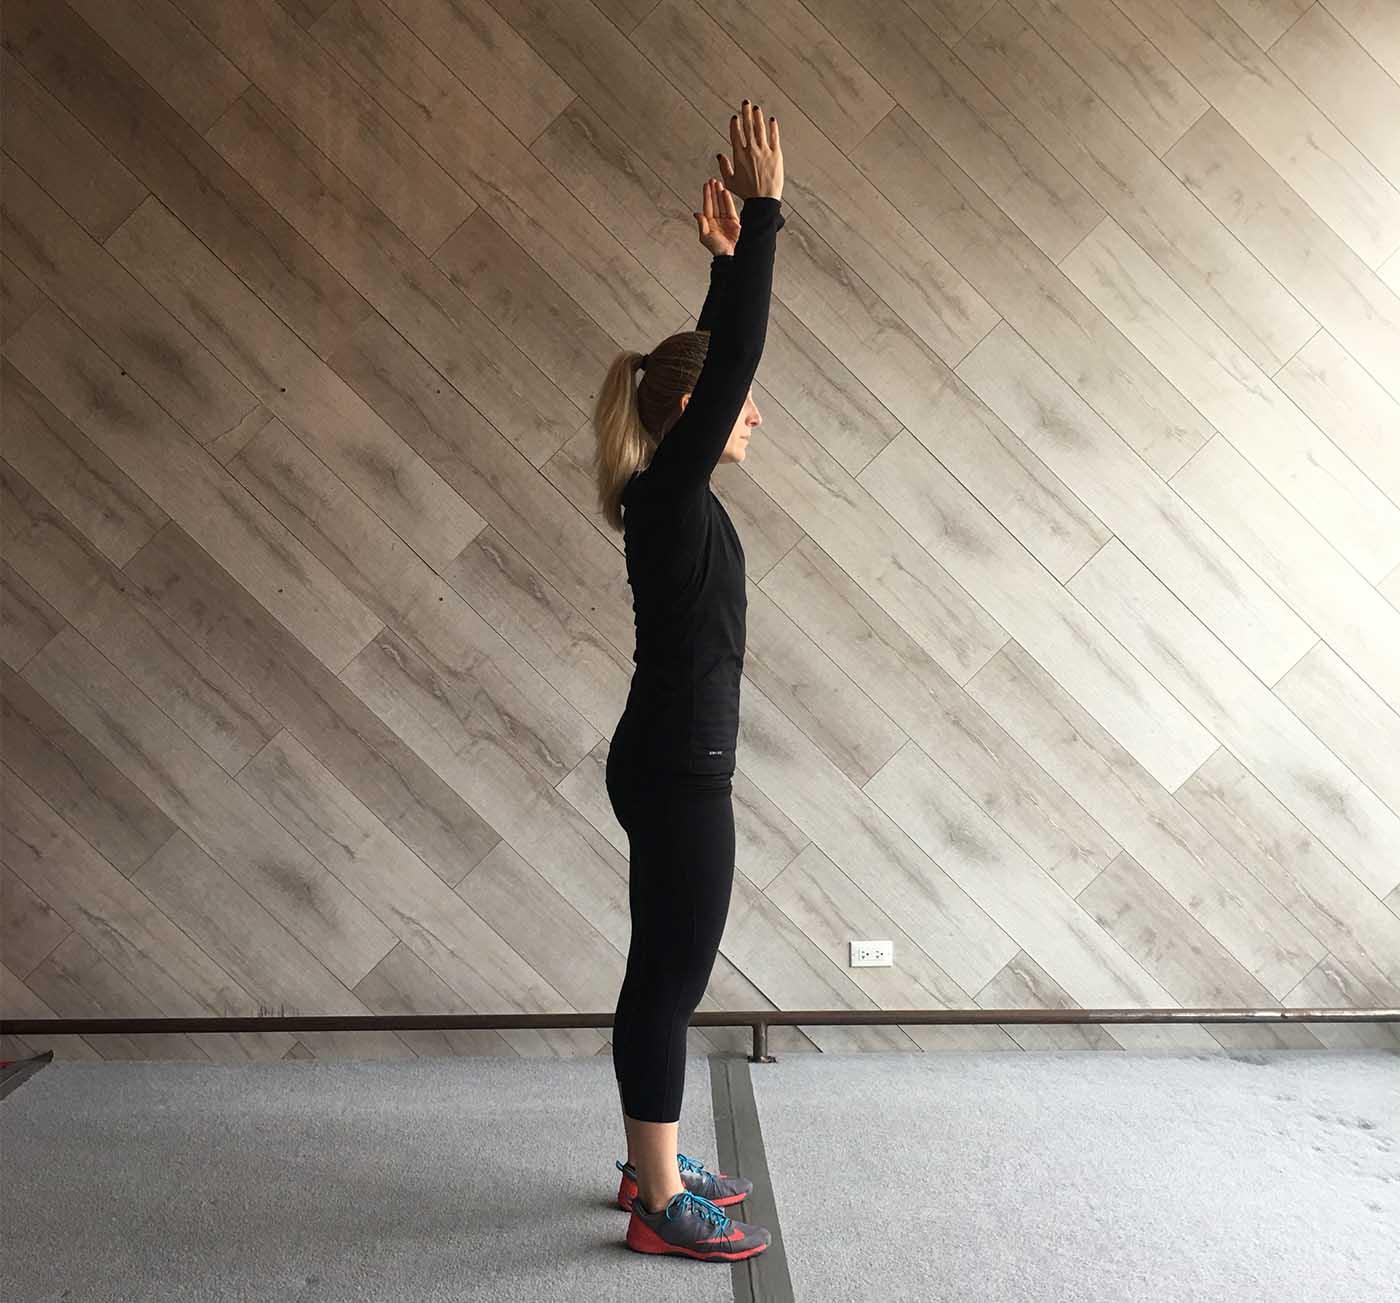 asweatlife_treadmill-challenge_overhead-lunge_3